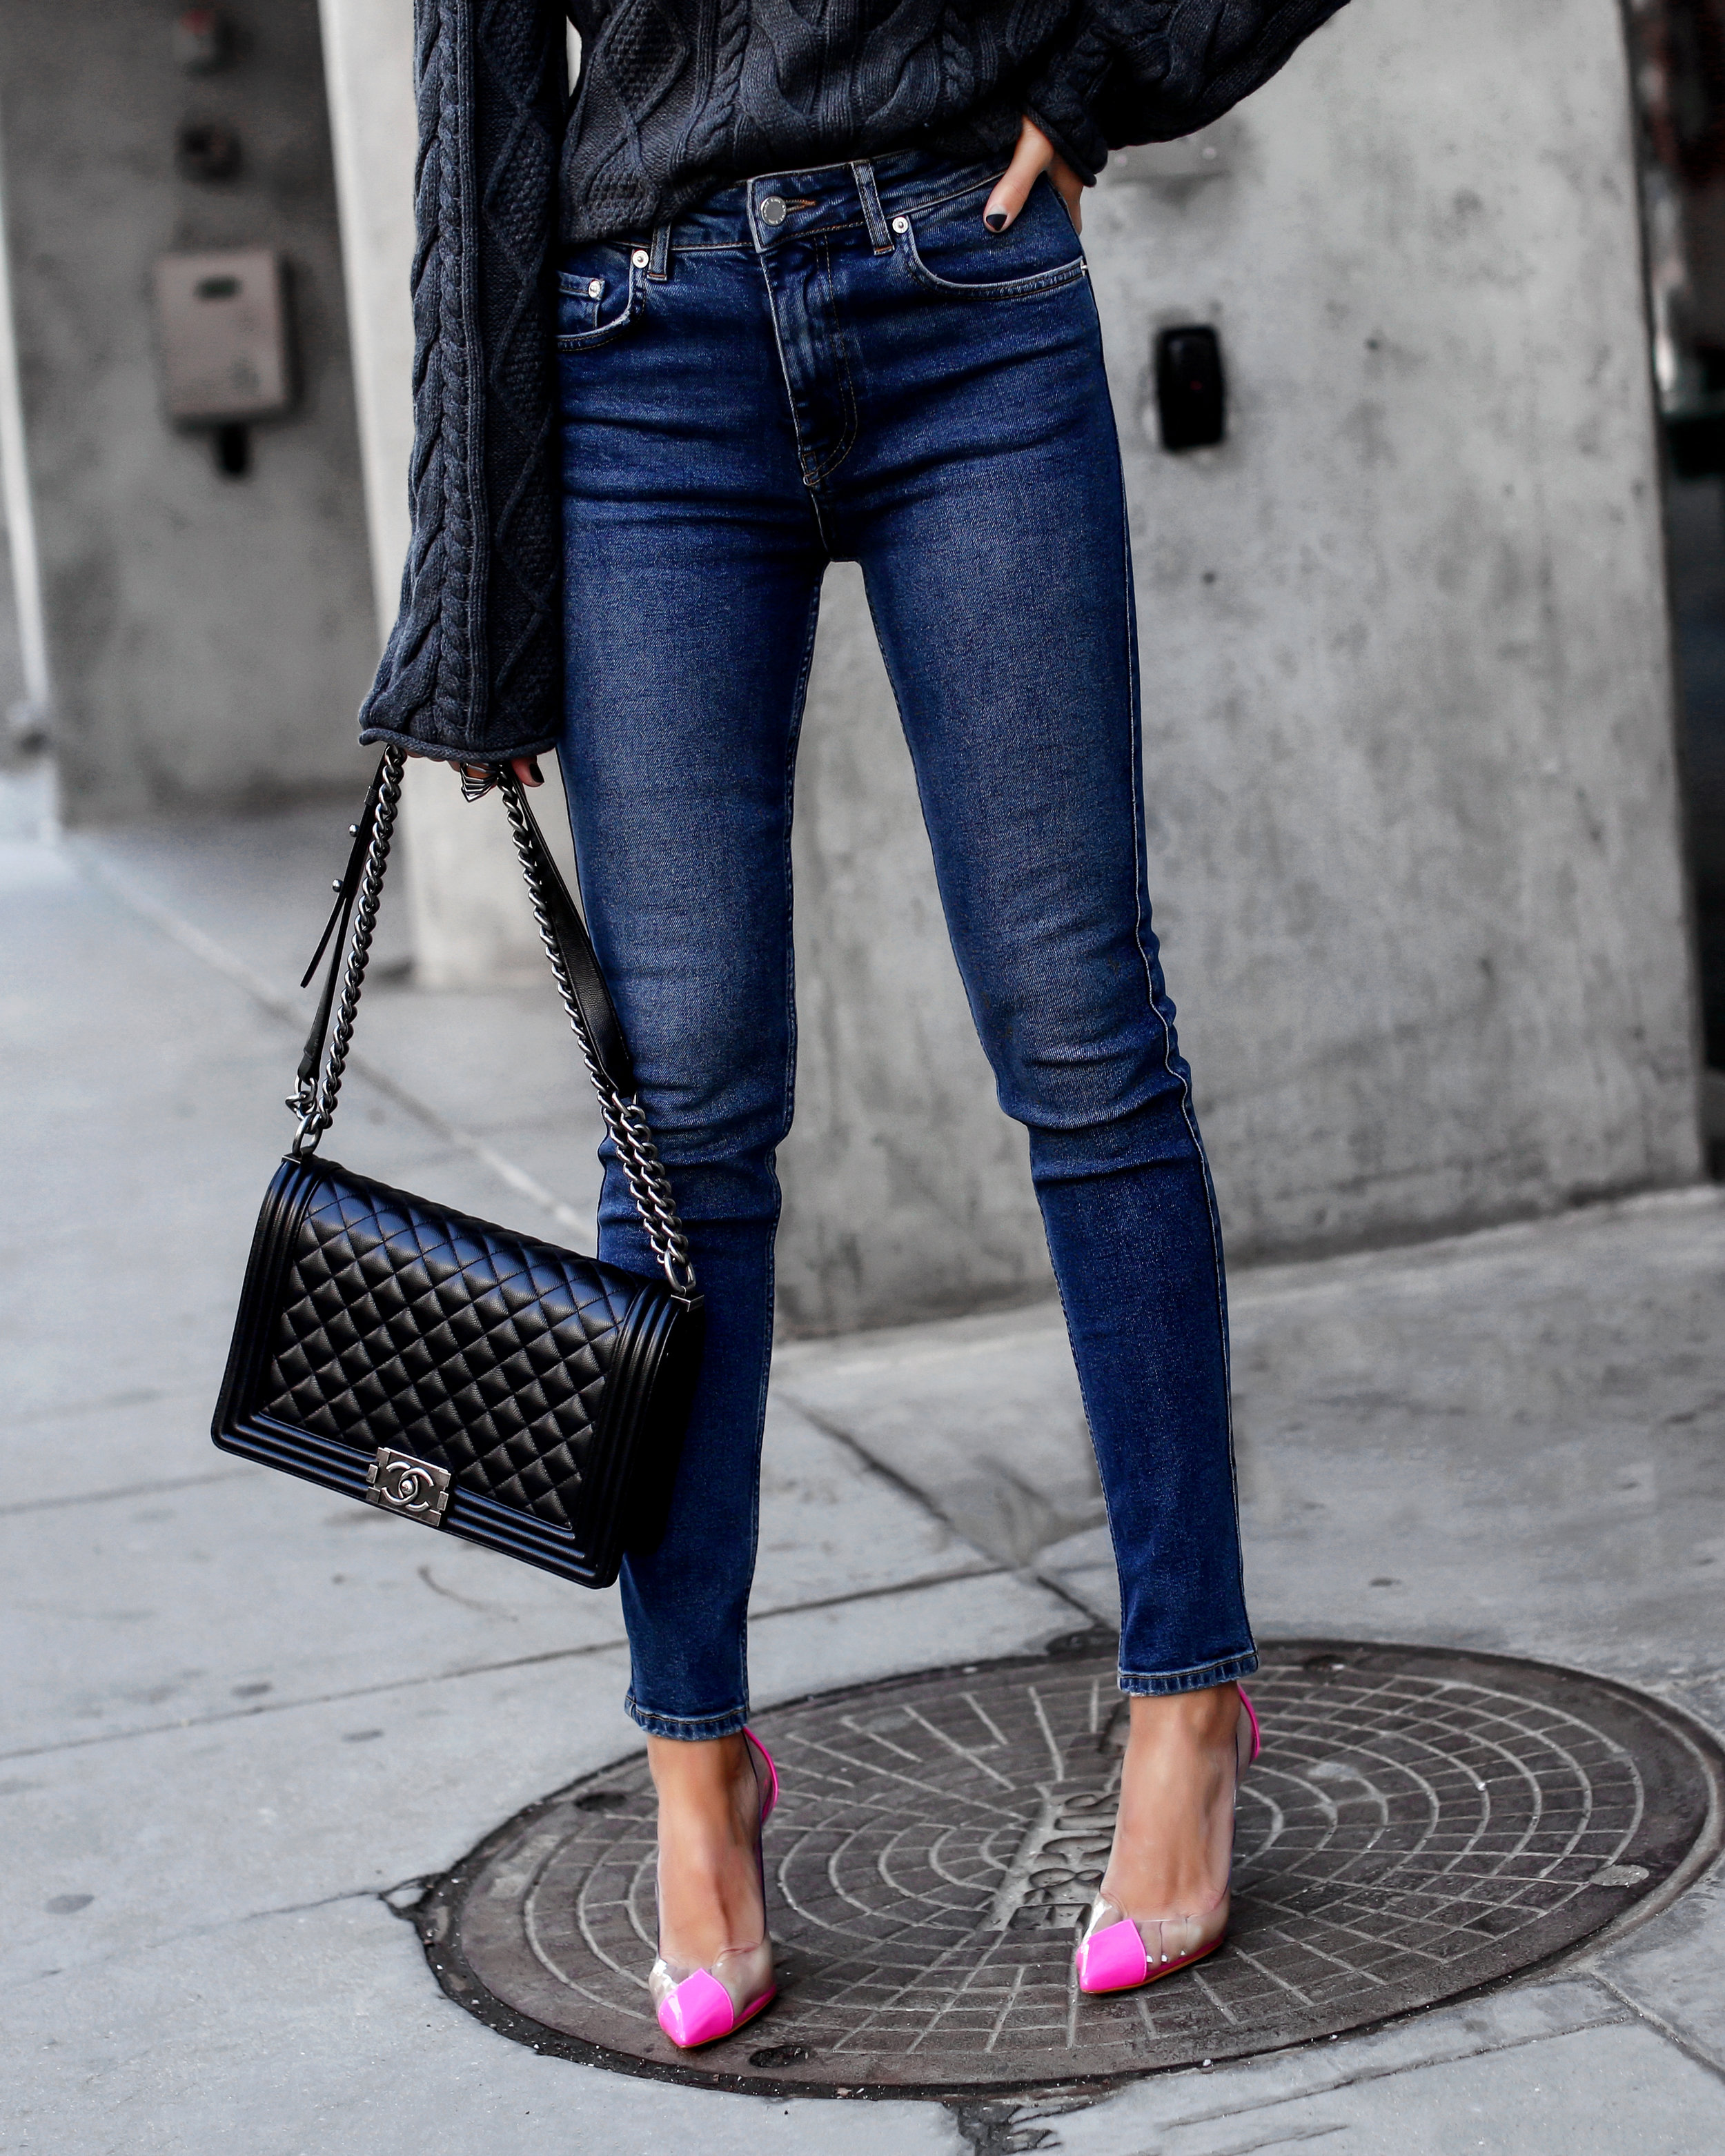 Detail Shot of Chanel Boy Bag and Schutz Neon Heels